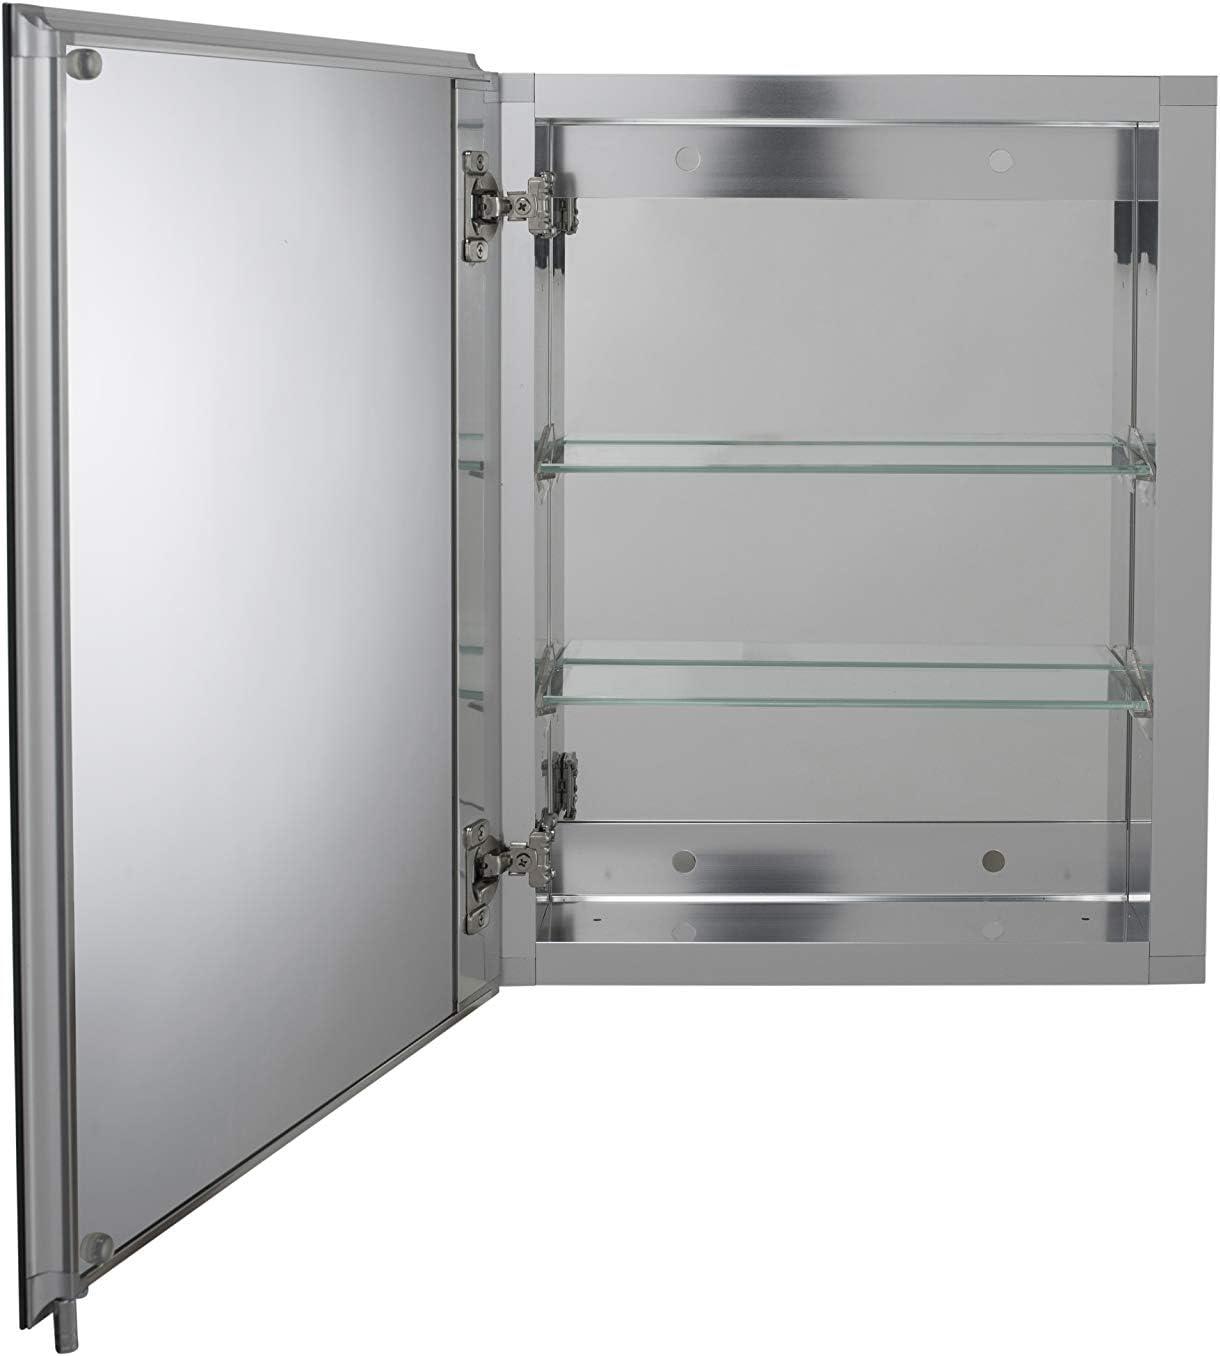 1 anta Croydex WC101369 Armadietto in alluminio 51 x 66 cm